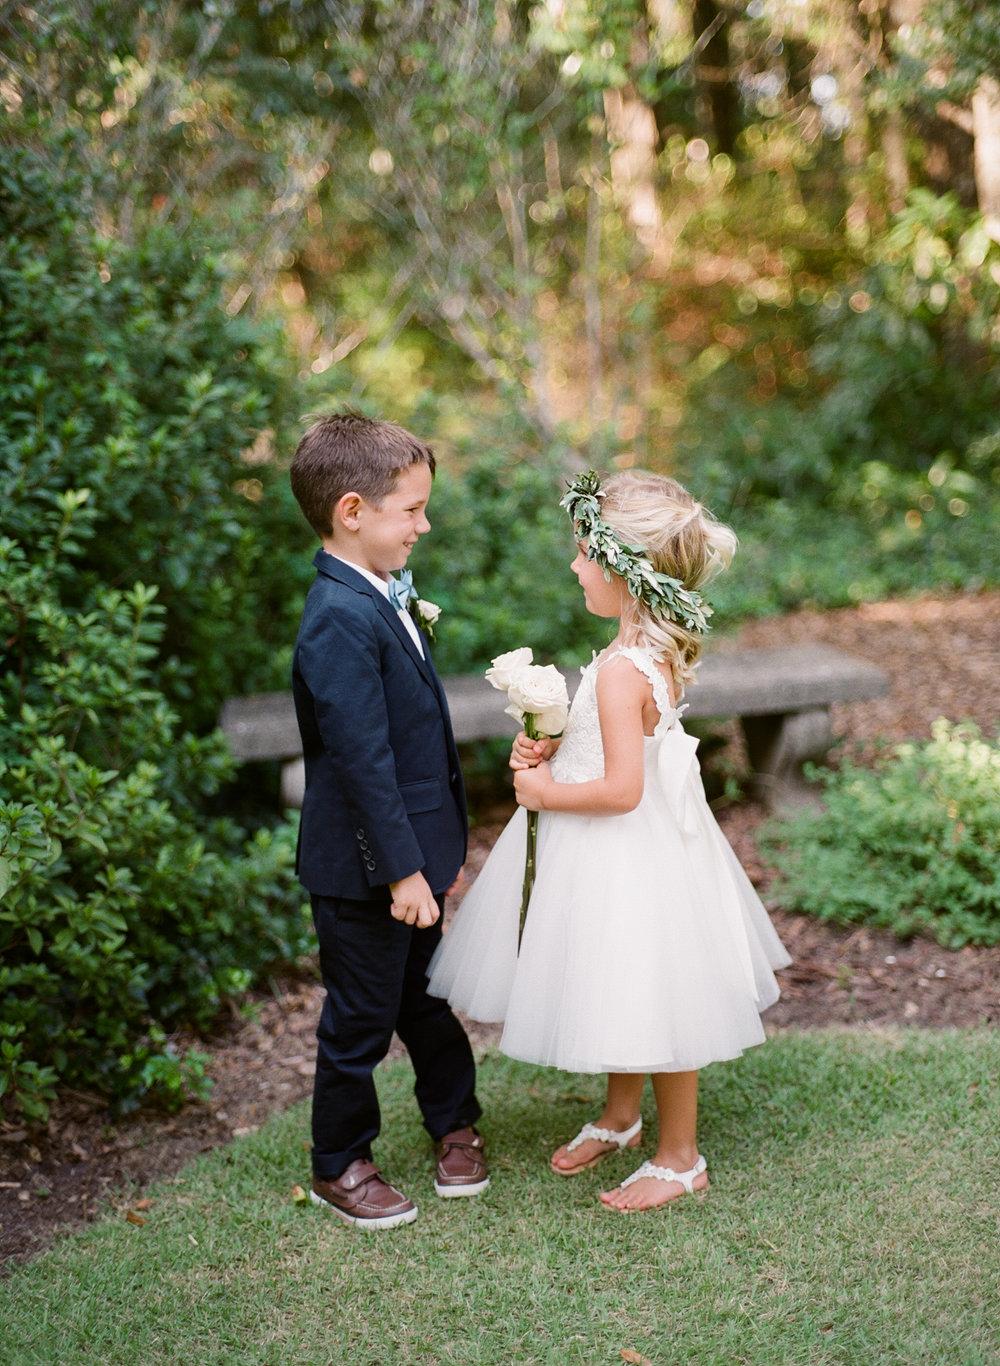 Airlie-Gardens-Wedding-36.jpg